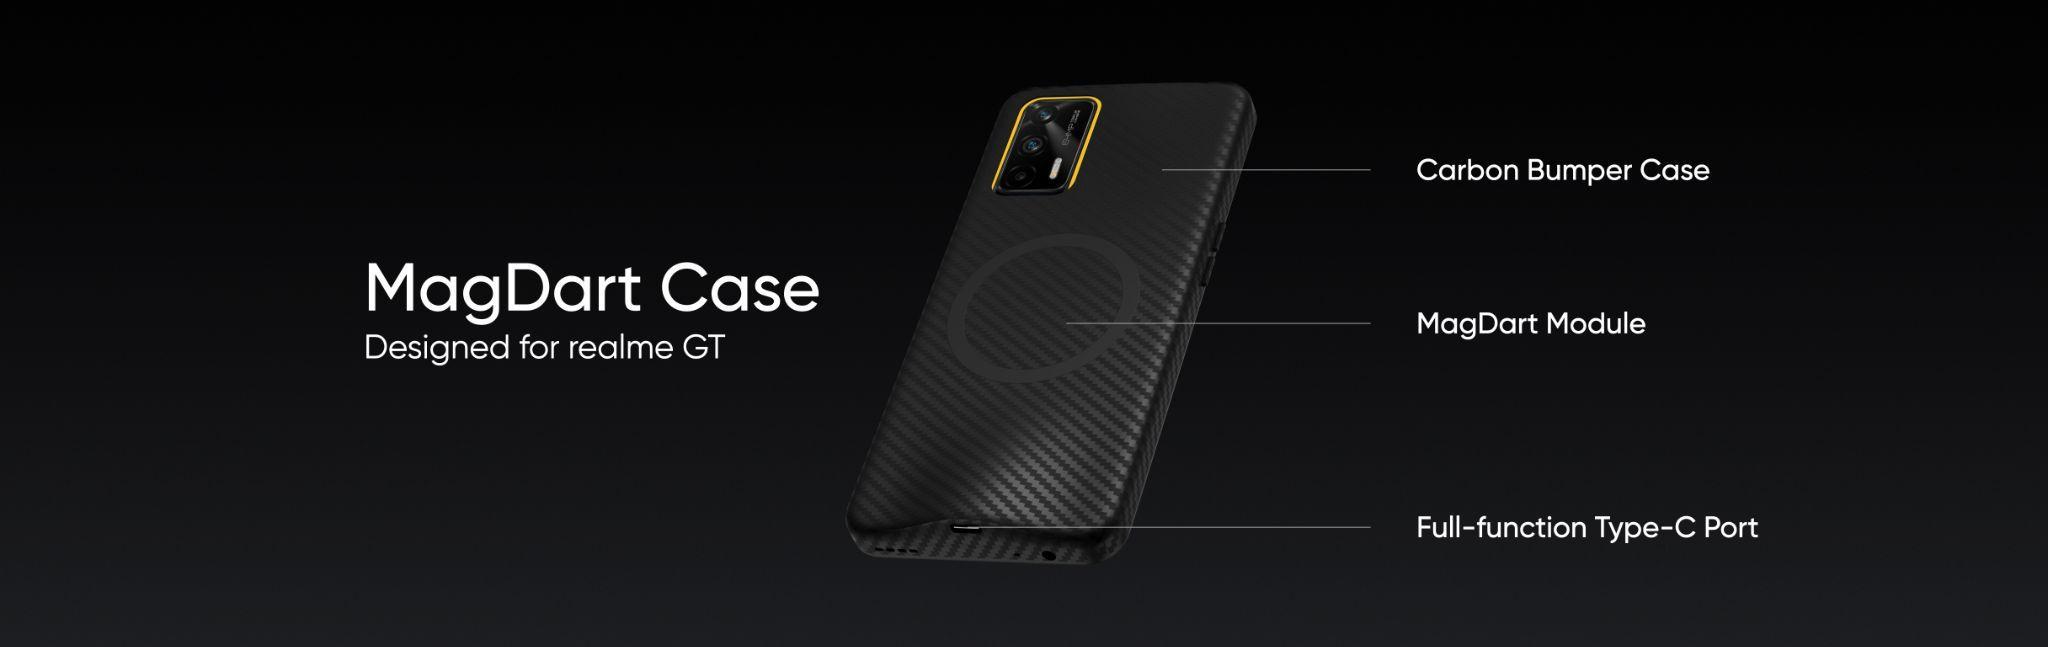 realme GT MagDart Charging Case